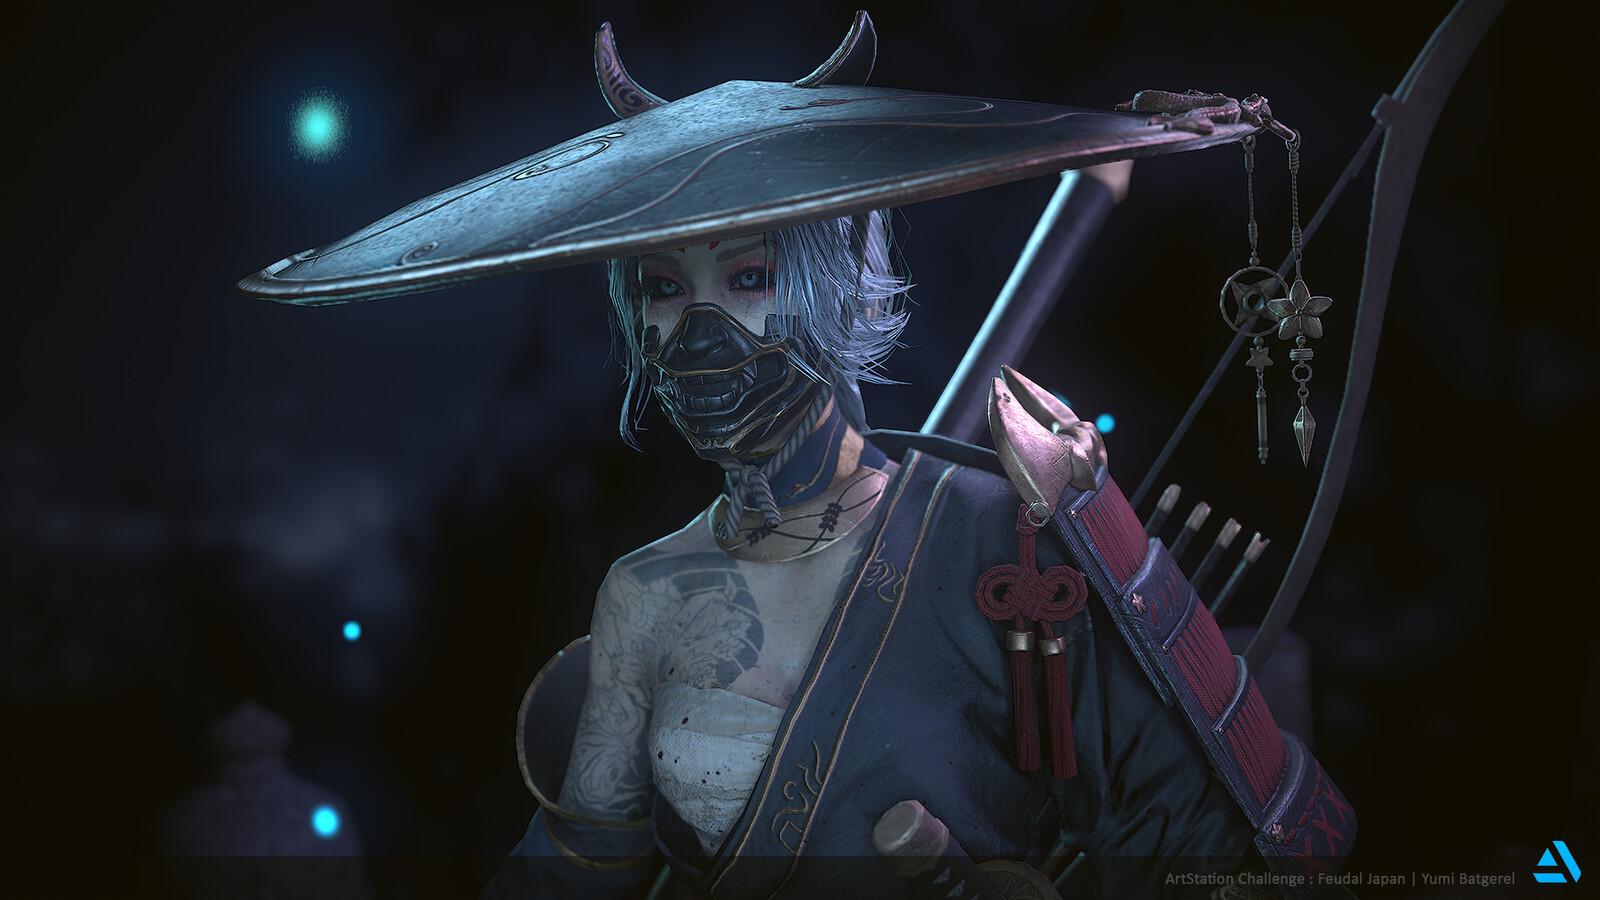 Feudal Japan: The Shogunate - Game Character Art (real-time)